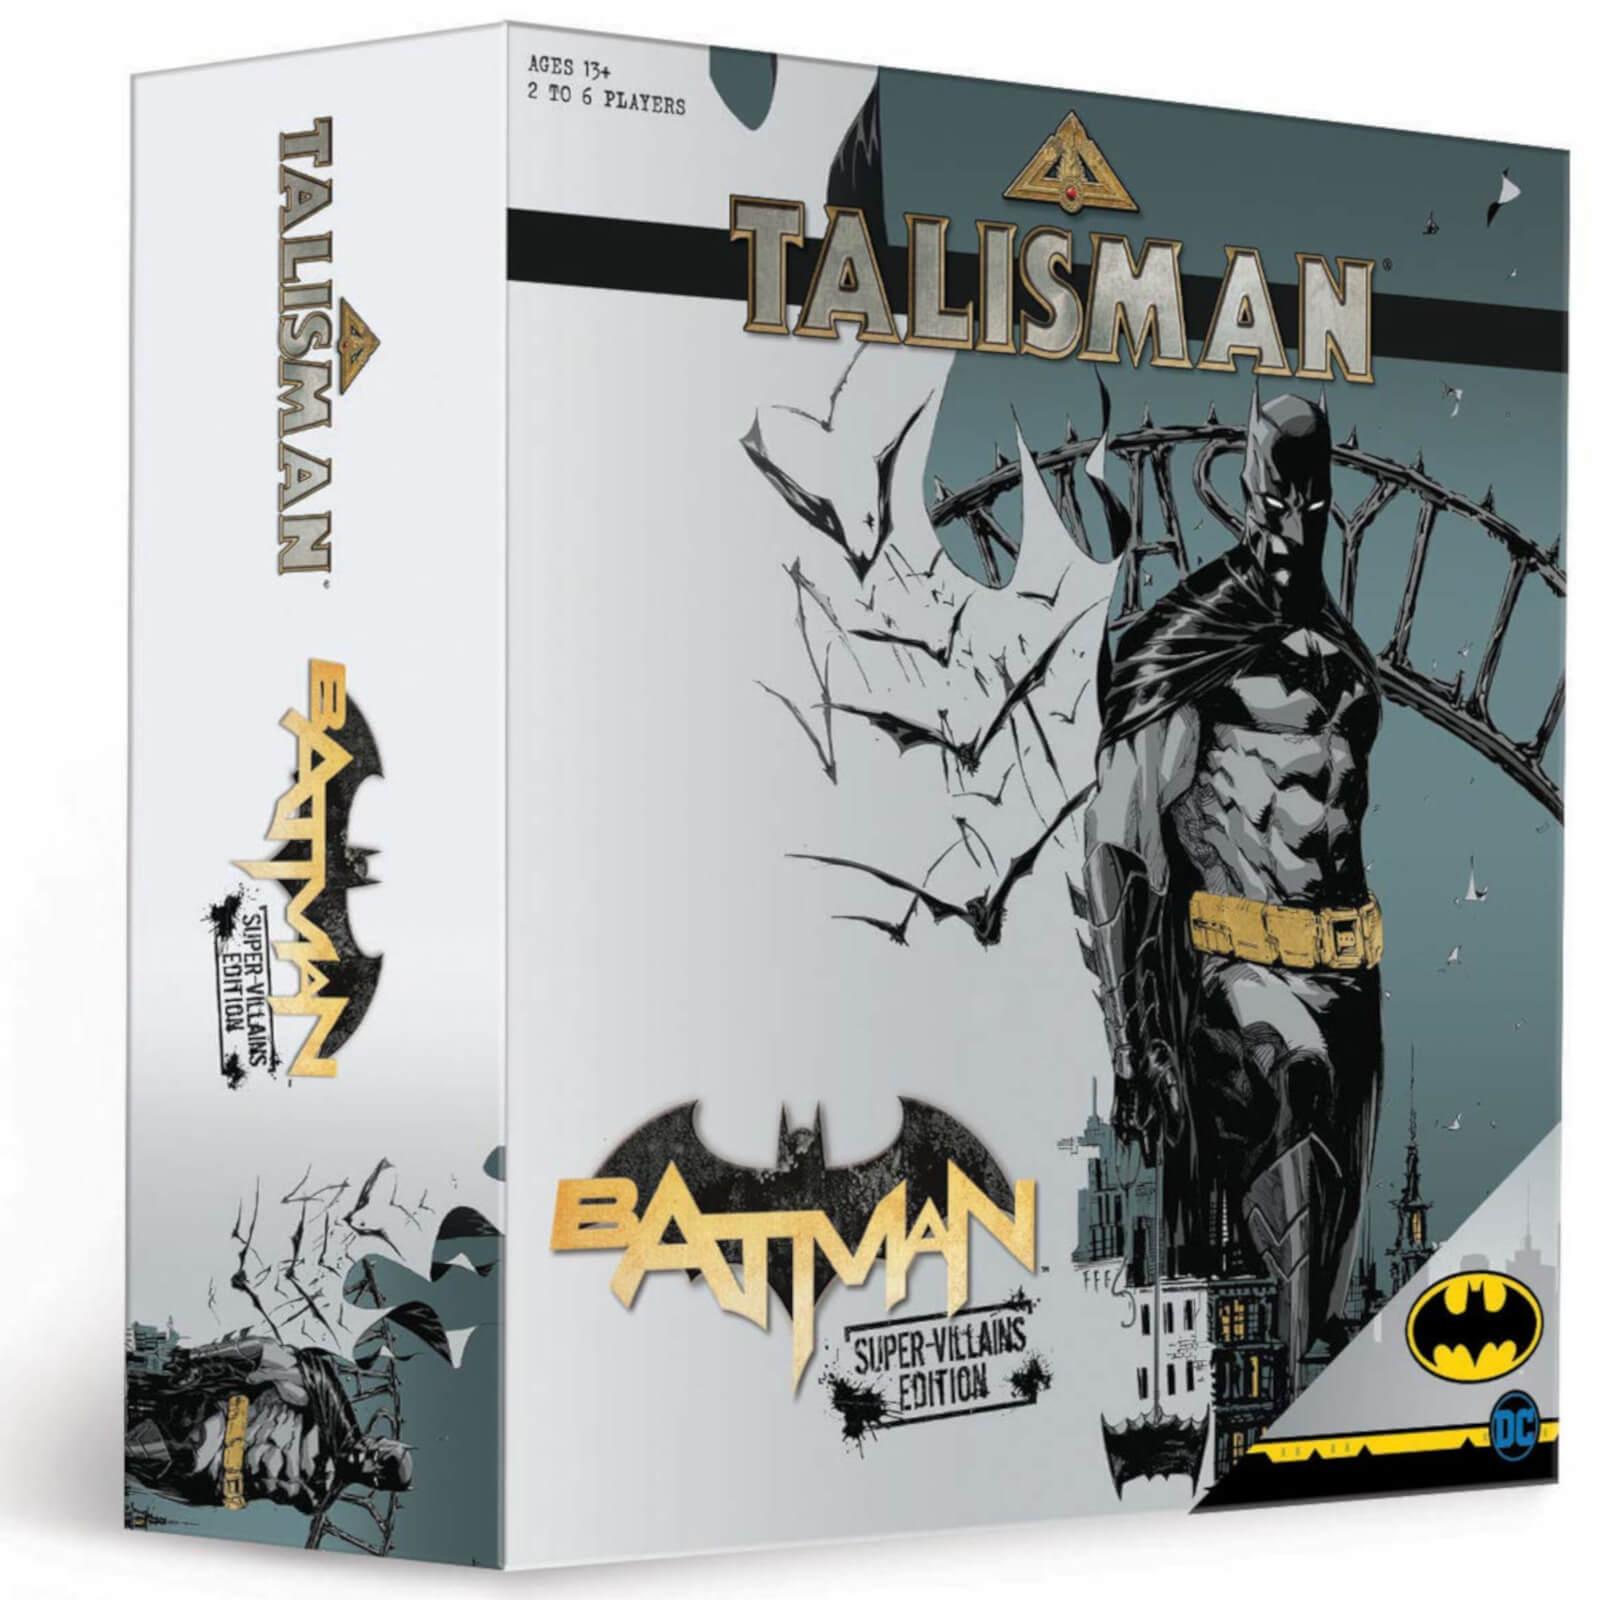 Image of Batman Board Game Talisman: Super-Villains Edition